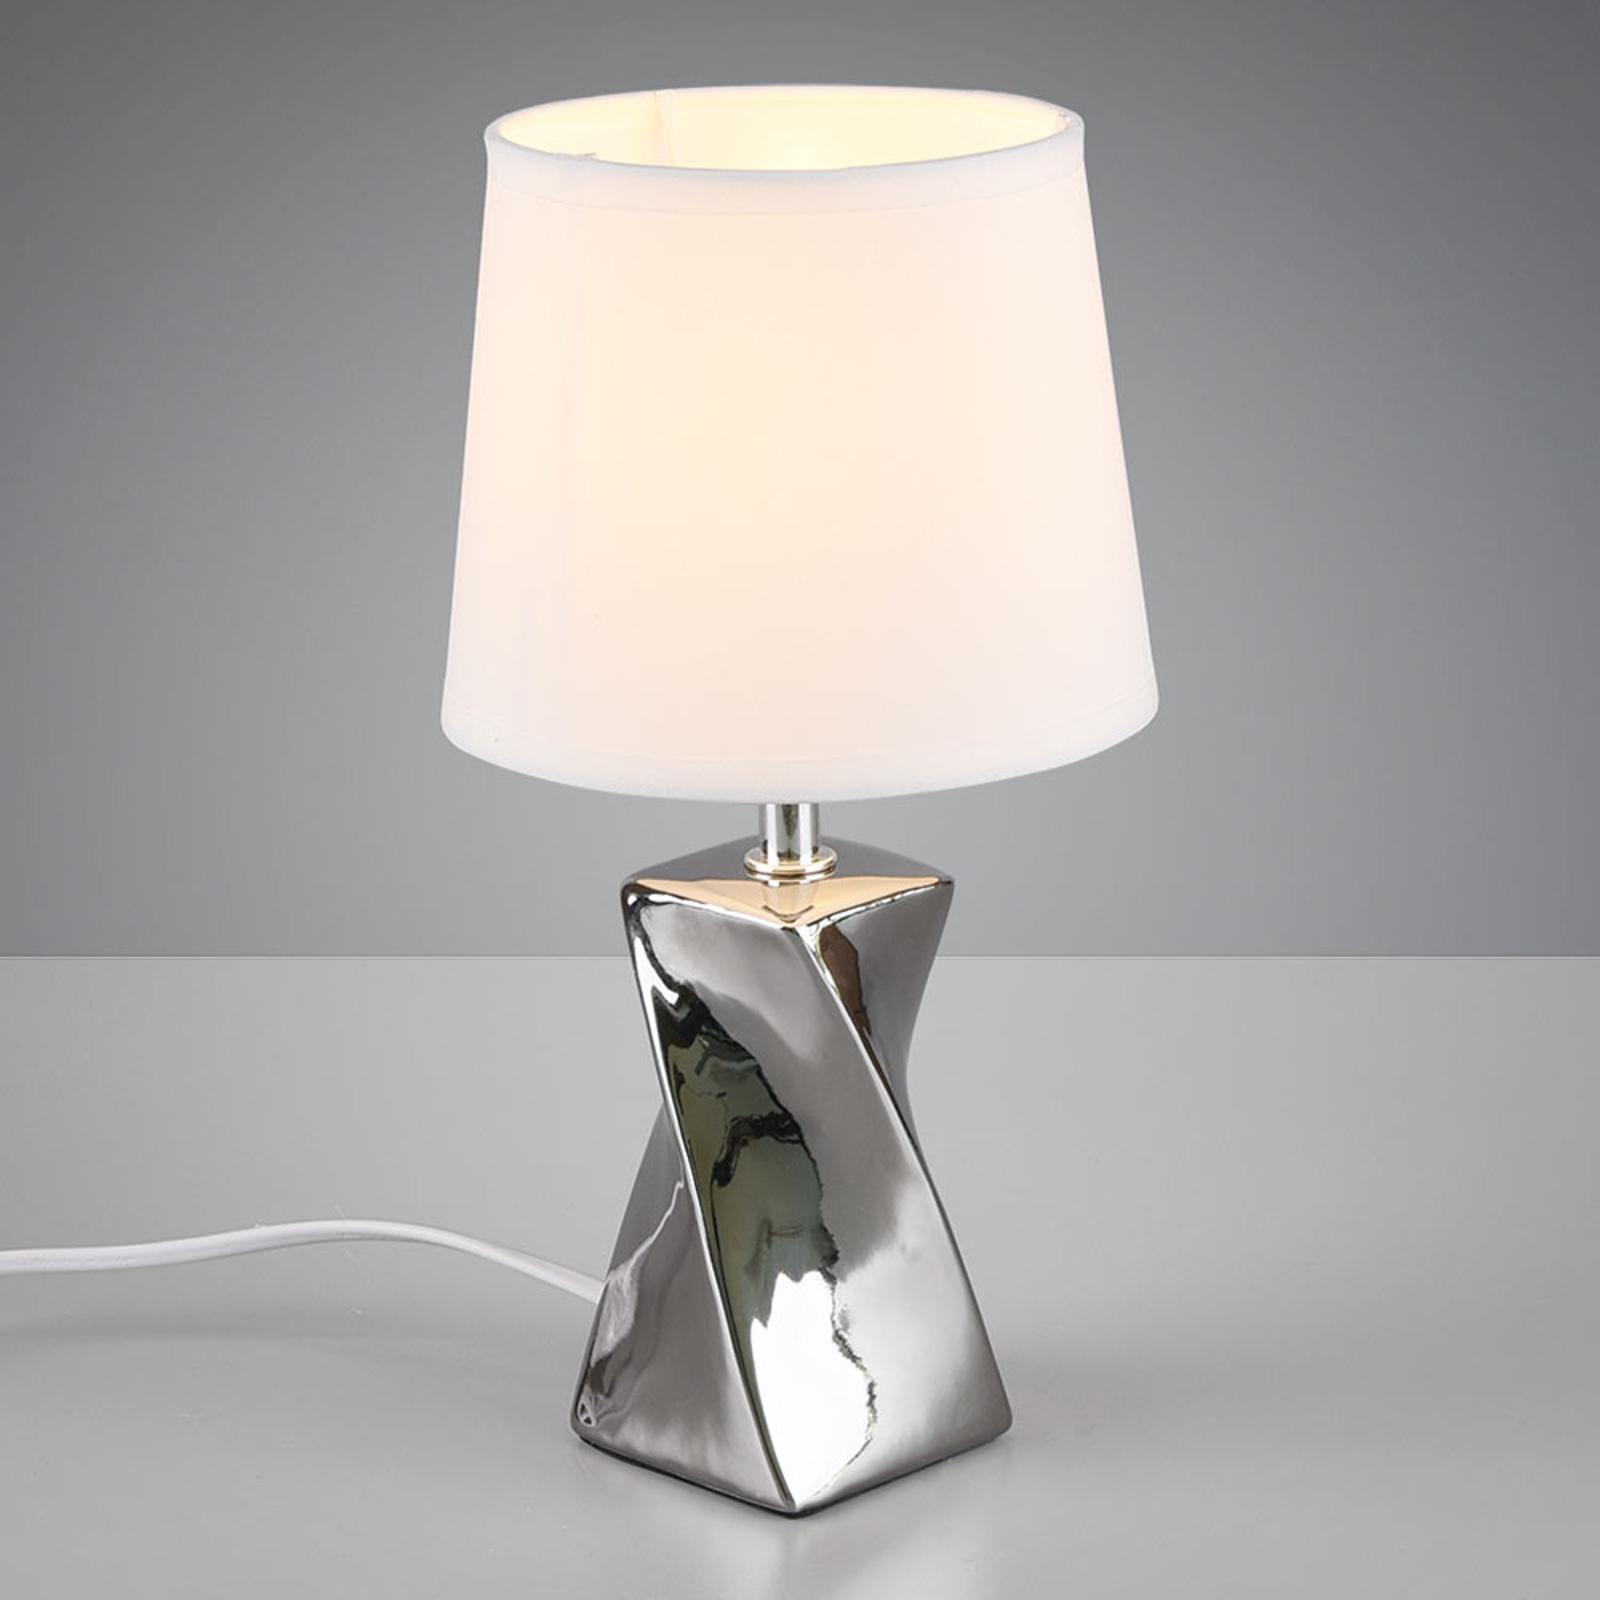 Lámpara de mesa Abeba Ø 15 cm, blanco-plata